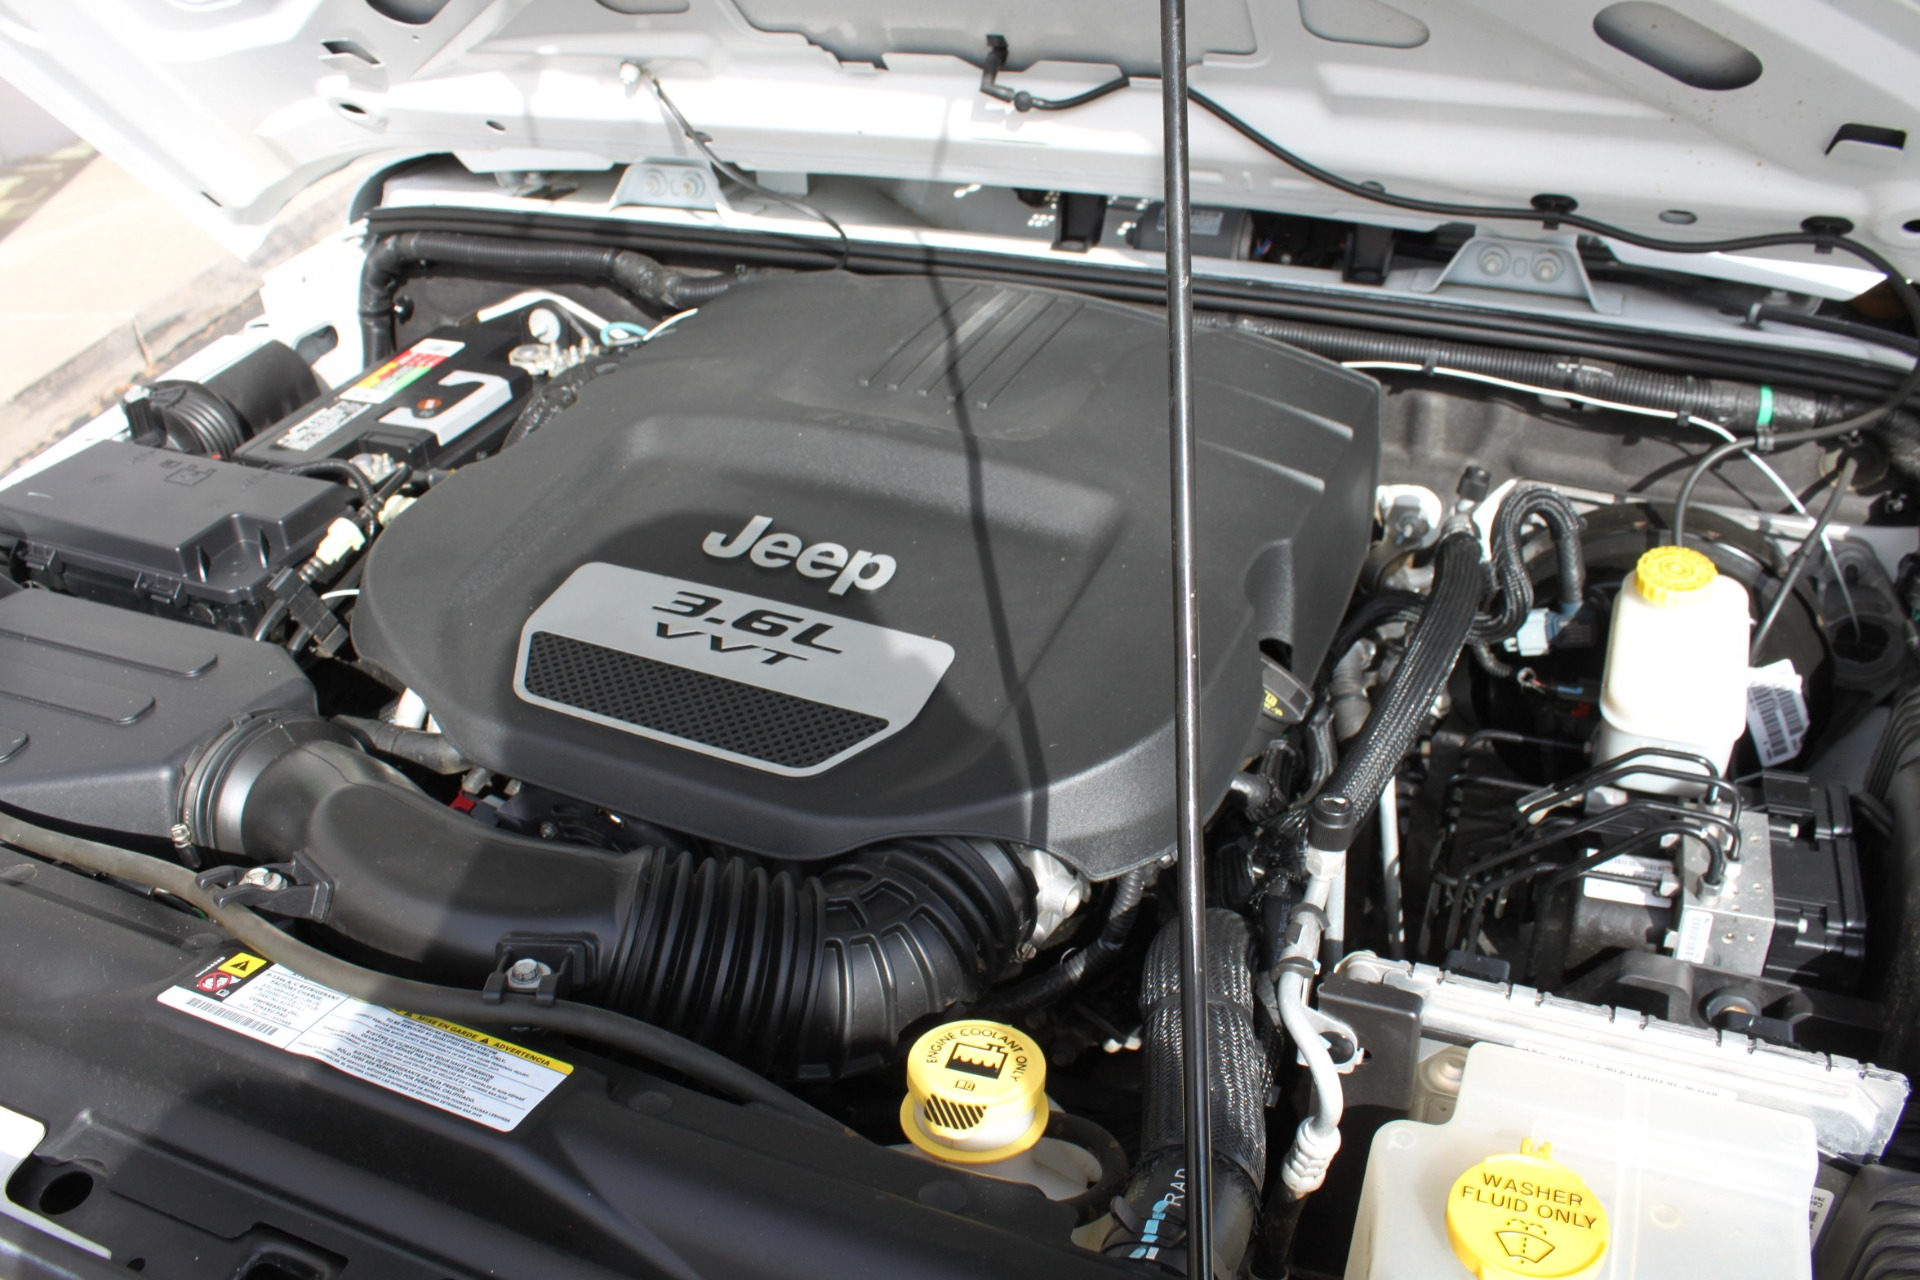 Used-2012-Jeep-Wrangler-Freedom-Edition-4X4-Chrysler